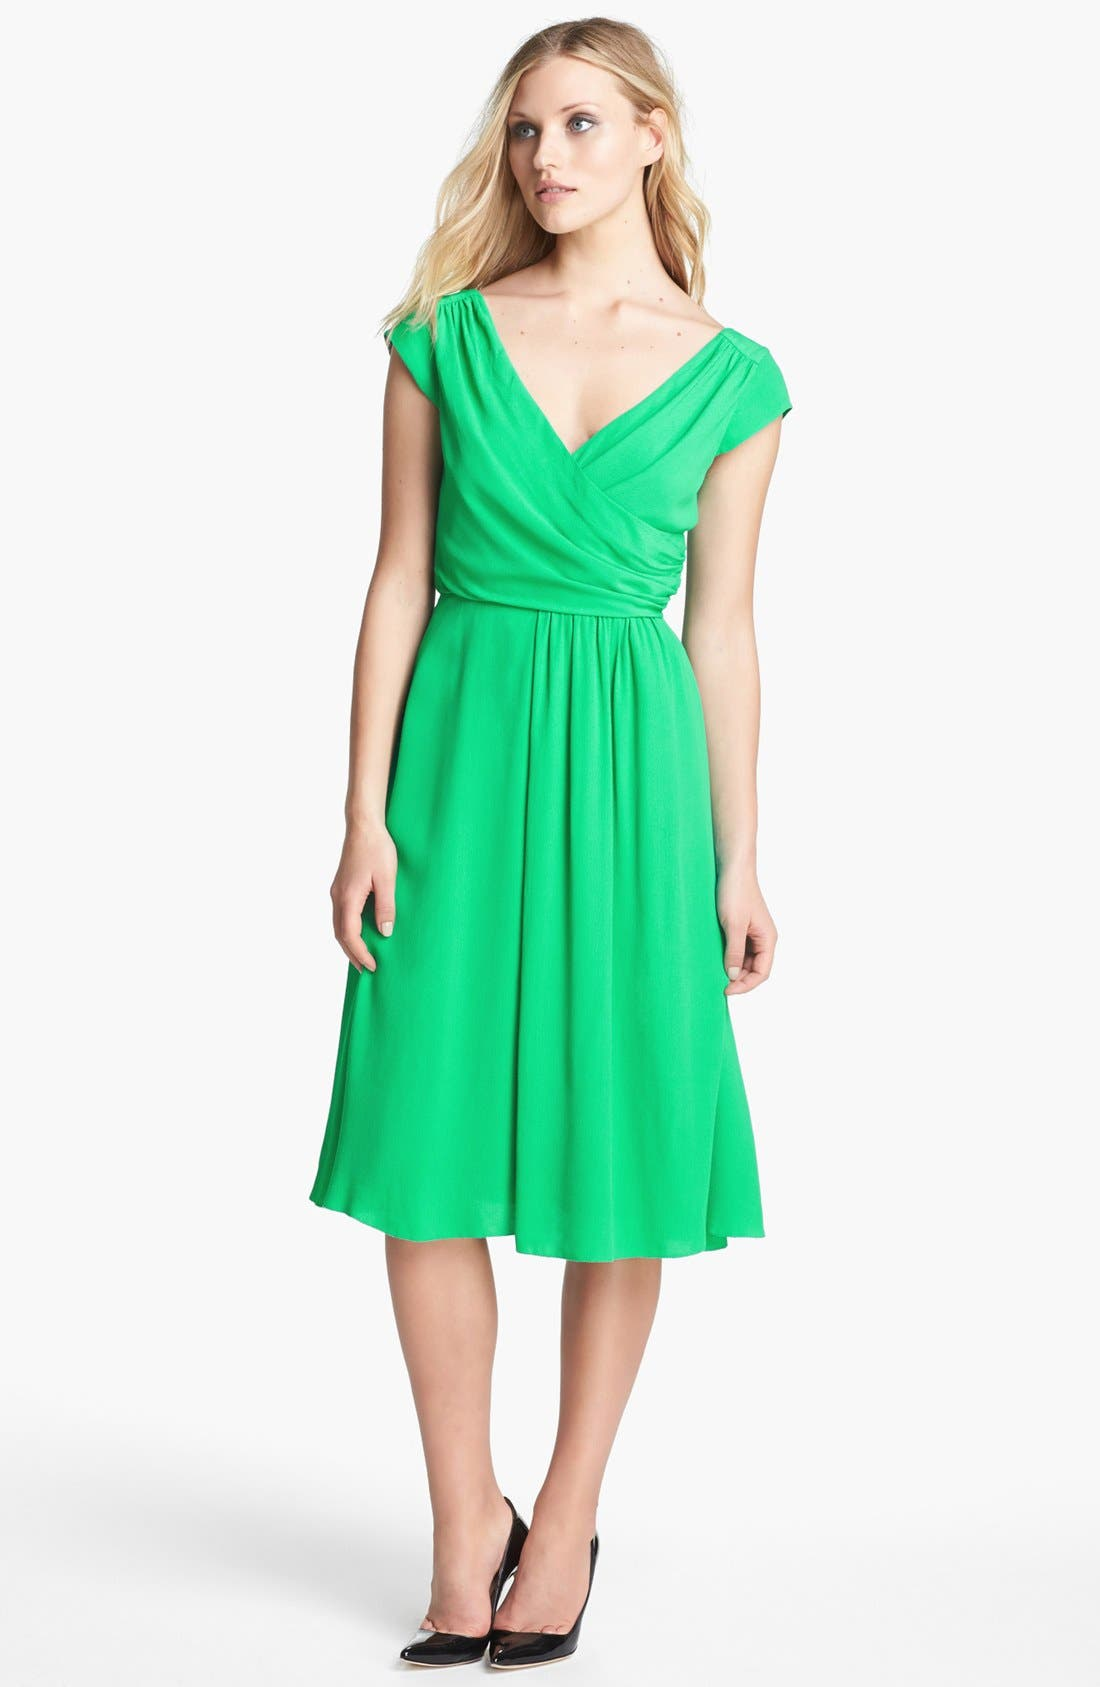 Alternate Image 1 Selected - kate spade new york 'lucia' dress